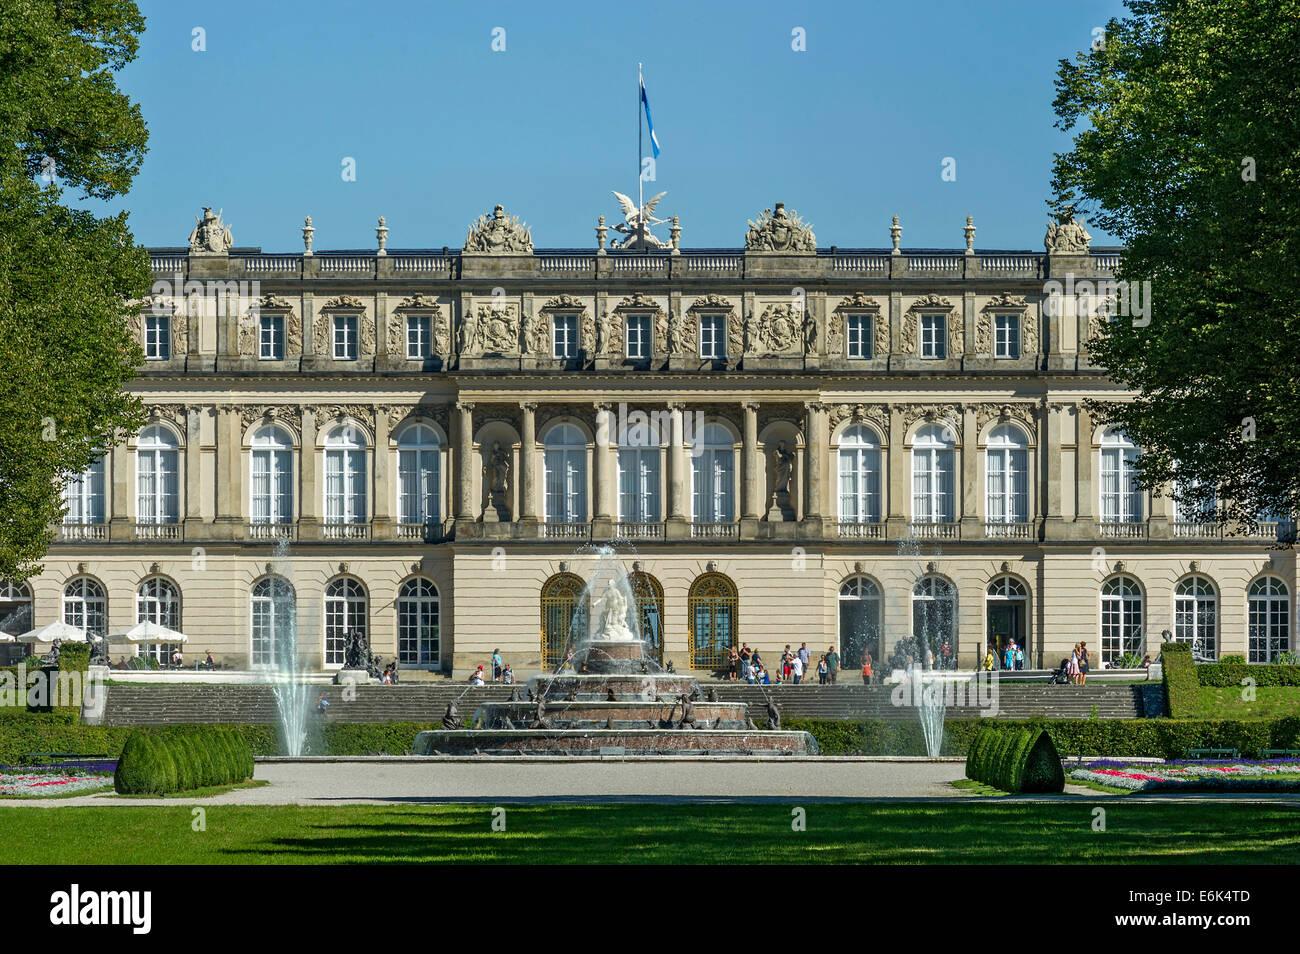 Herrenchiemsee New Palace, Fountain of Latona, Schlosspark palace gardens, Herreninsel island, Chiemsee lake, Chiemgau - Stock Image